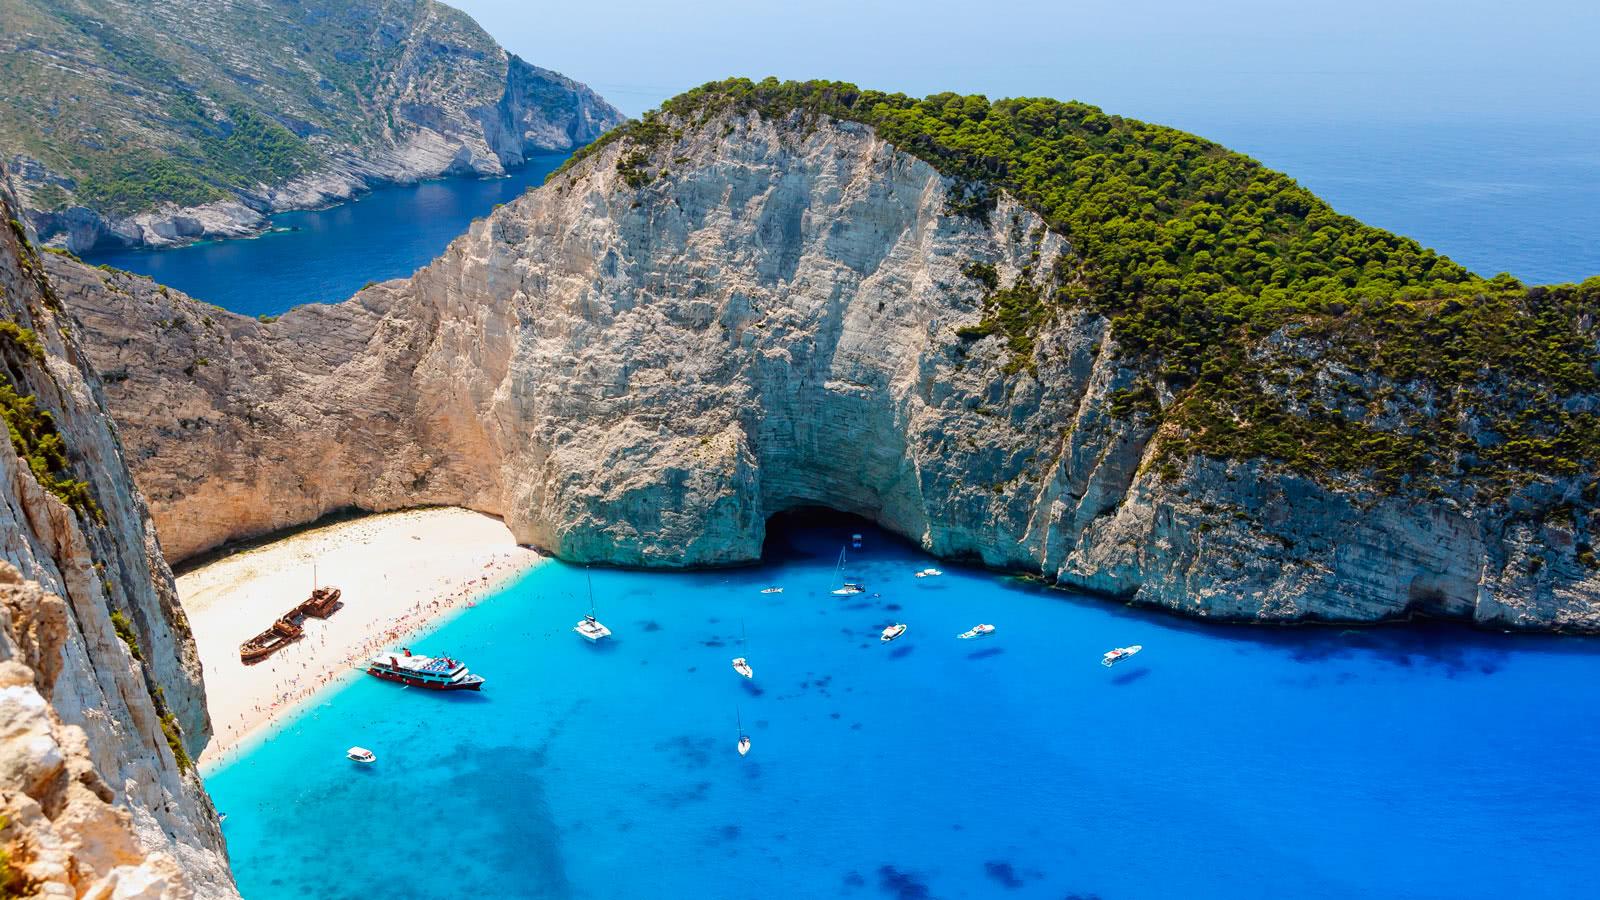 <b>希腊的十个最佳旅游地点,一起来欣赏爱琴海的明珠</b>